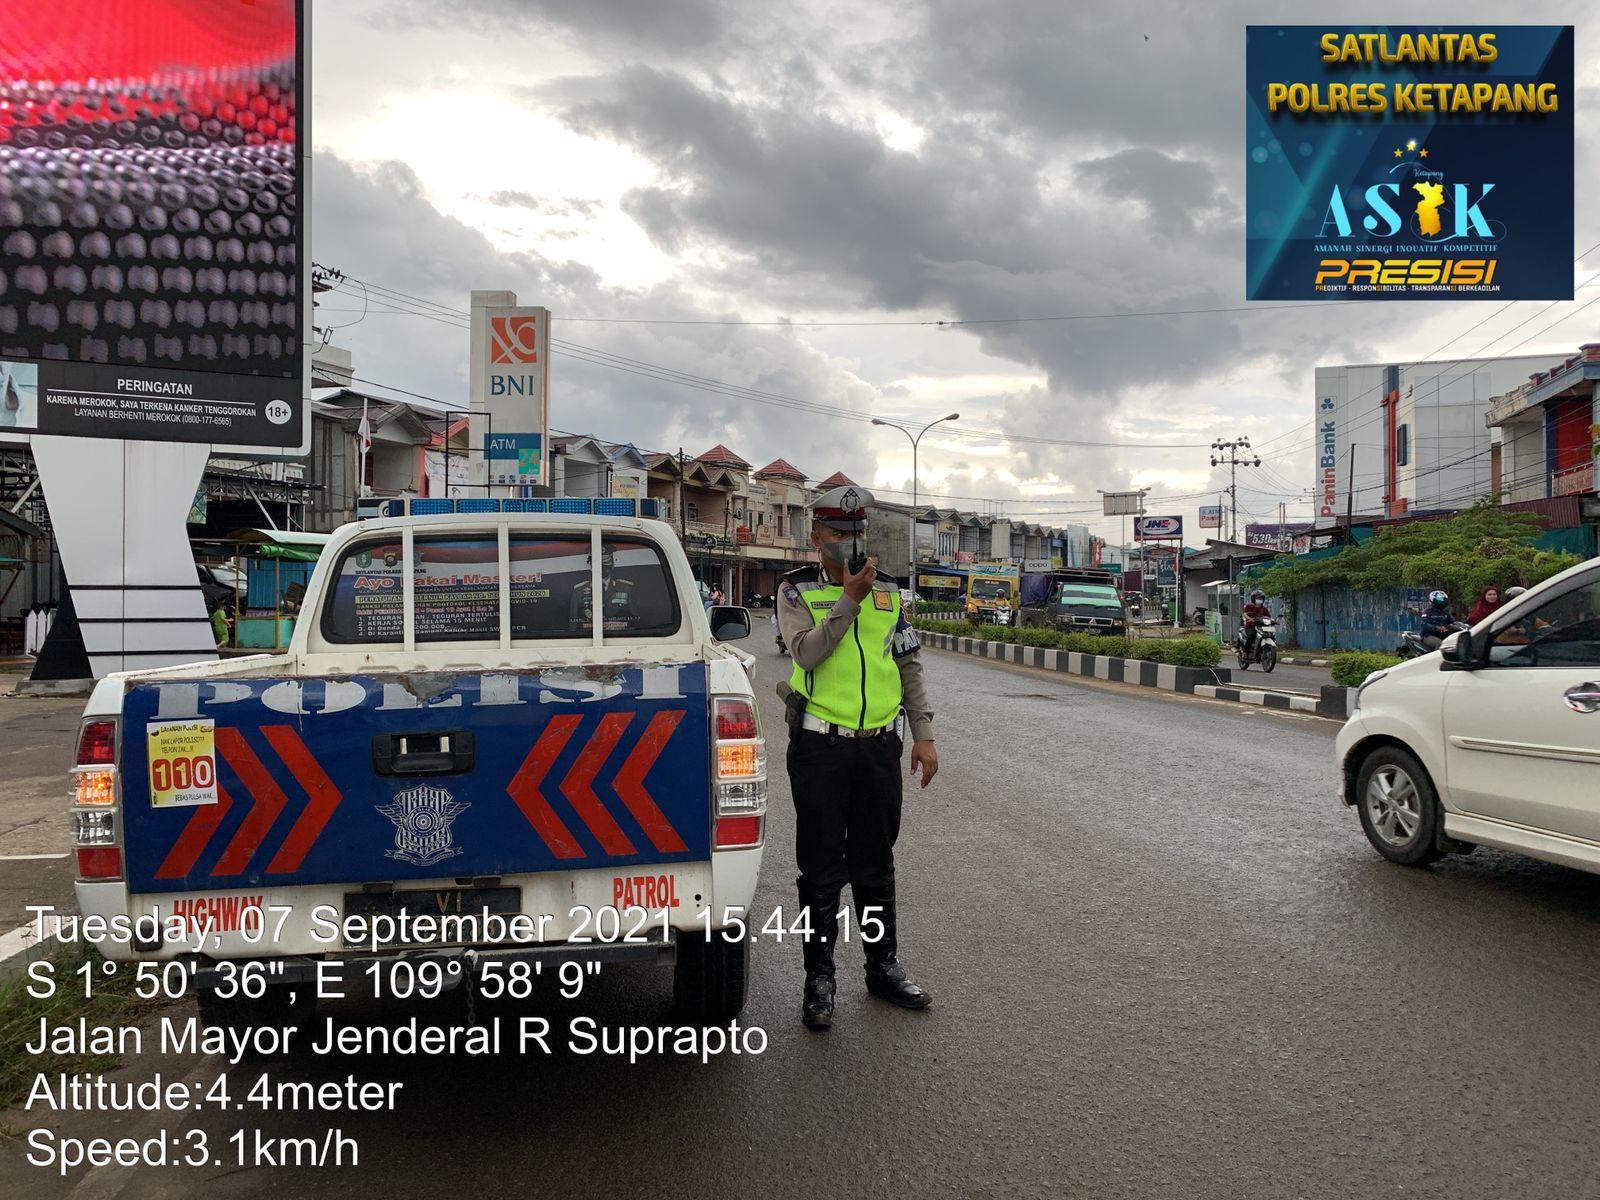 Sat Lantas Melaksanakan Giat Patroli Sore Di Sekitar Kota Ketapang